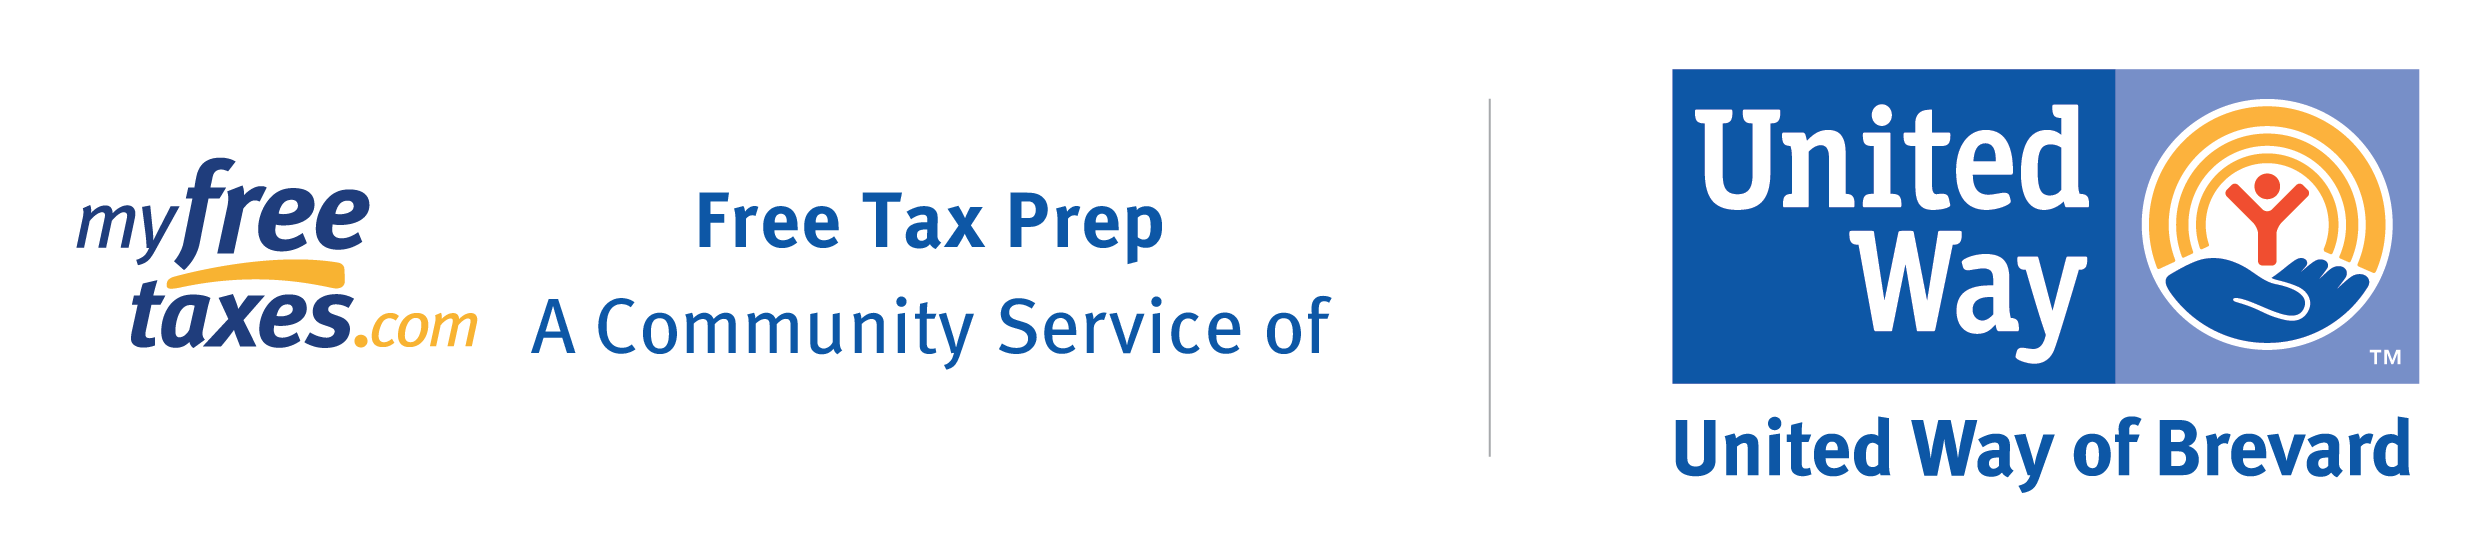 Free Tax Prep Logo